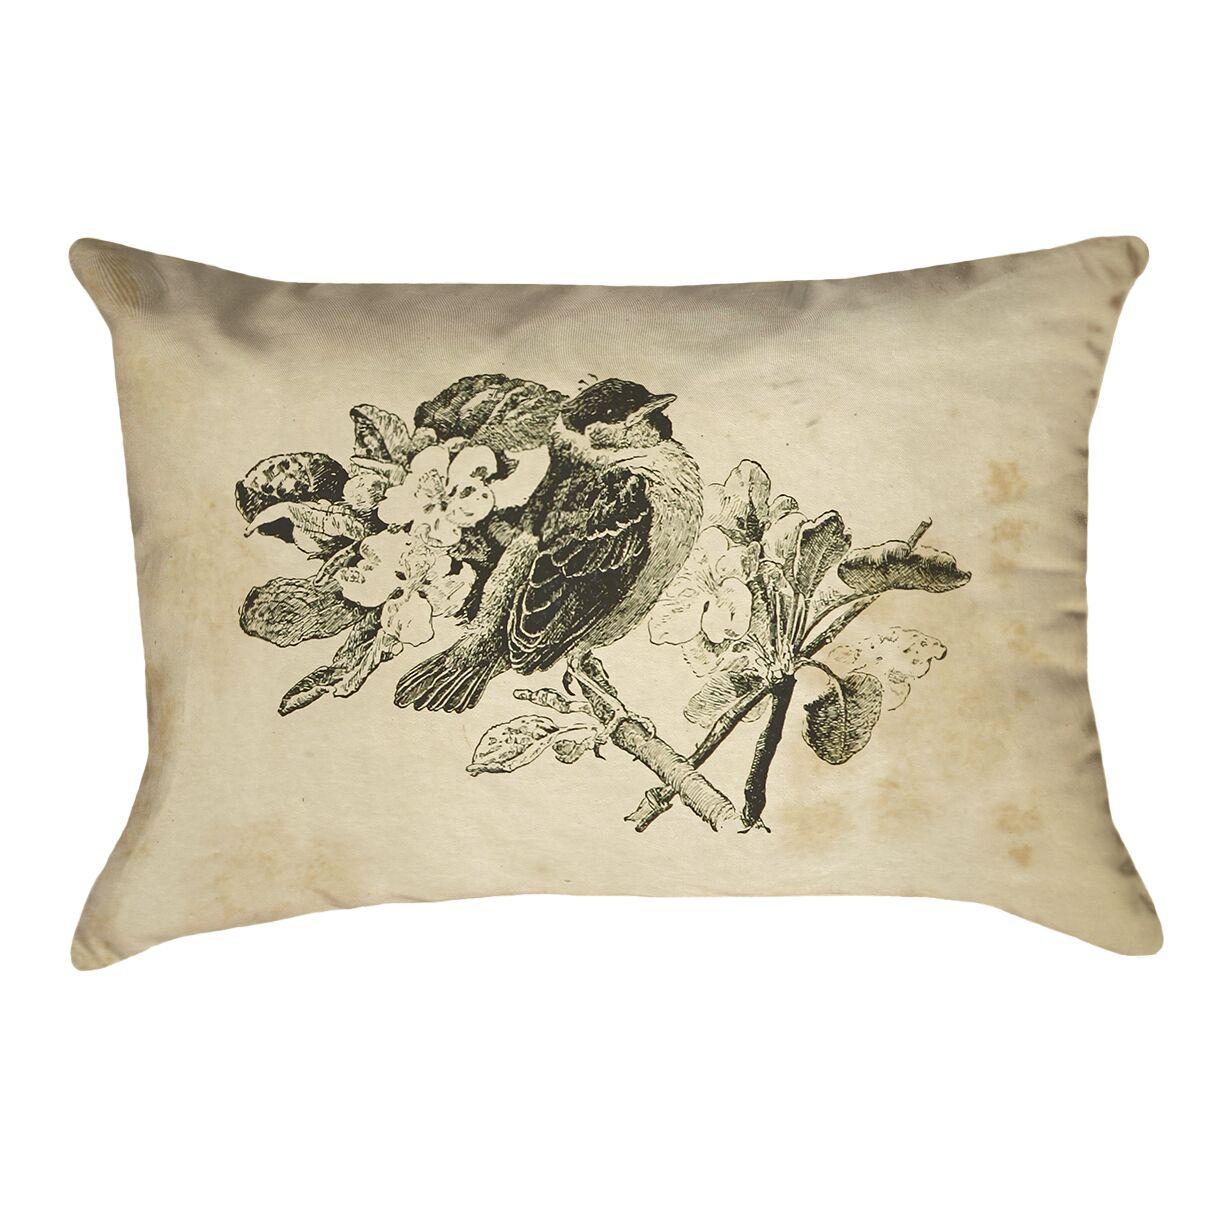 Venezia Vintage Bird Double Sided Pillow Cover